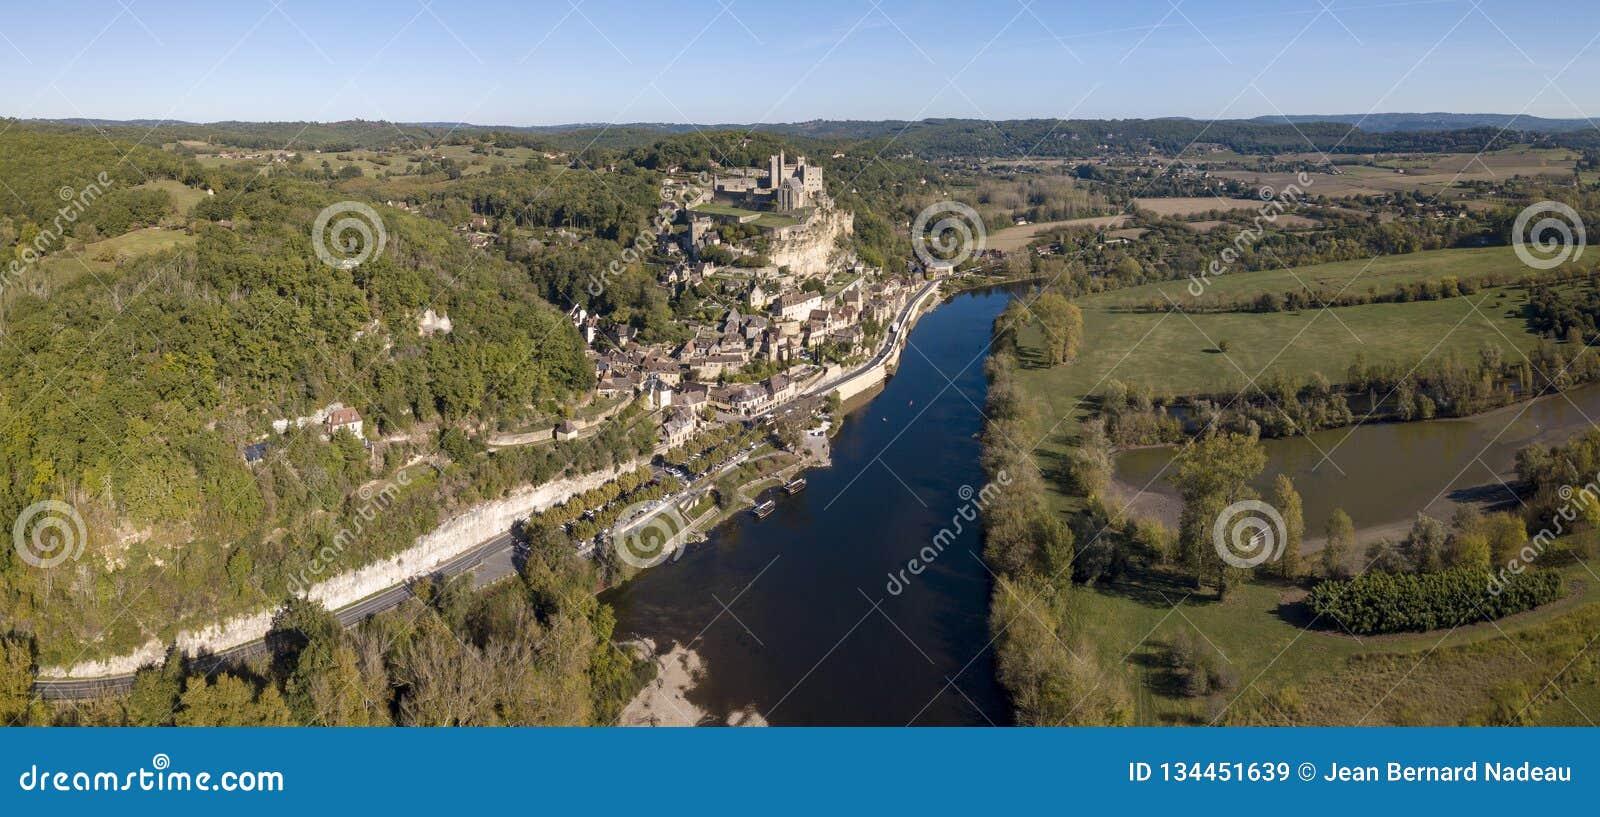 Chateau de Beynac, που σκαρφαλώνει στο βράχο του επάνω από τον ποταμό Dordogne, Γαλλία